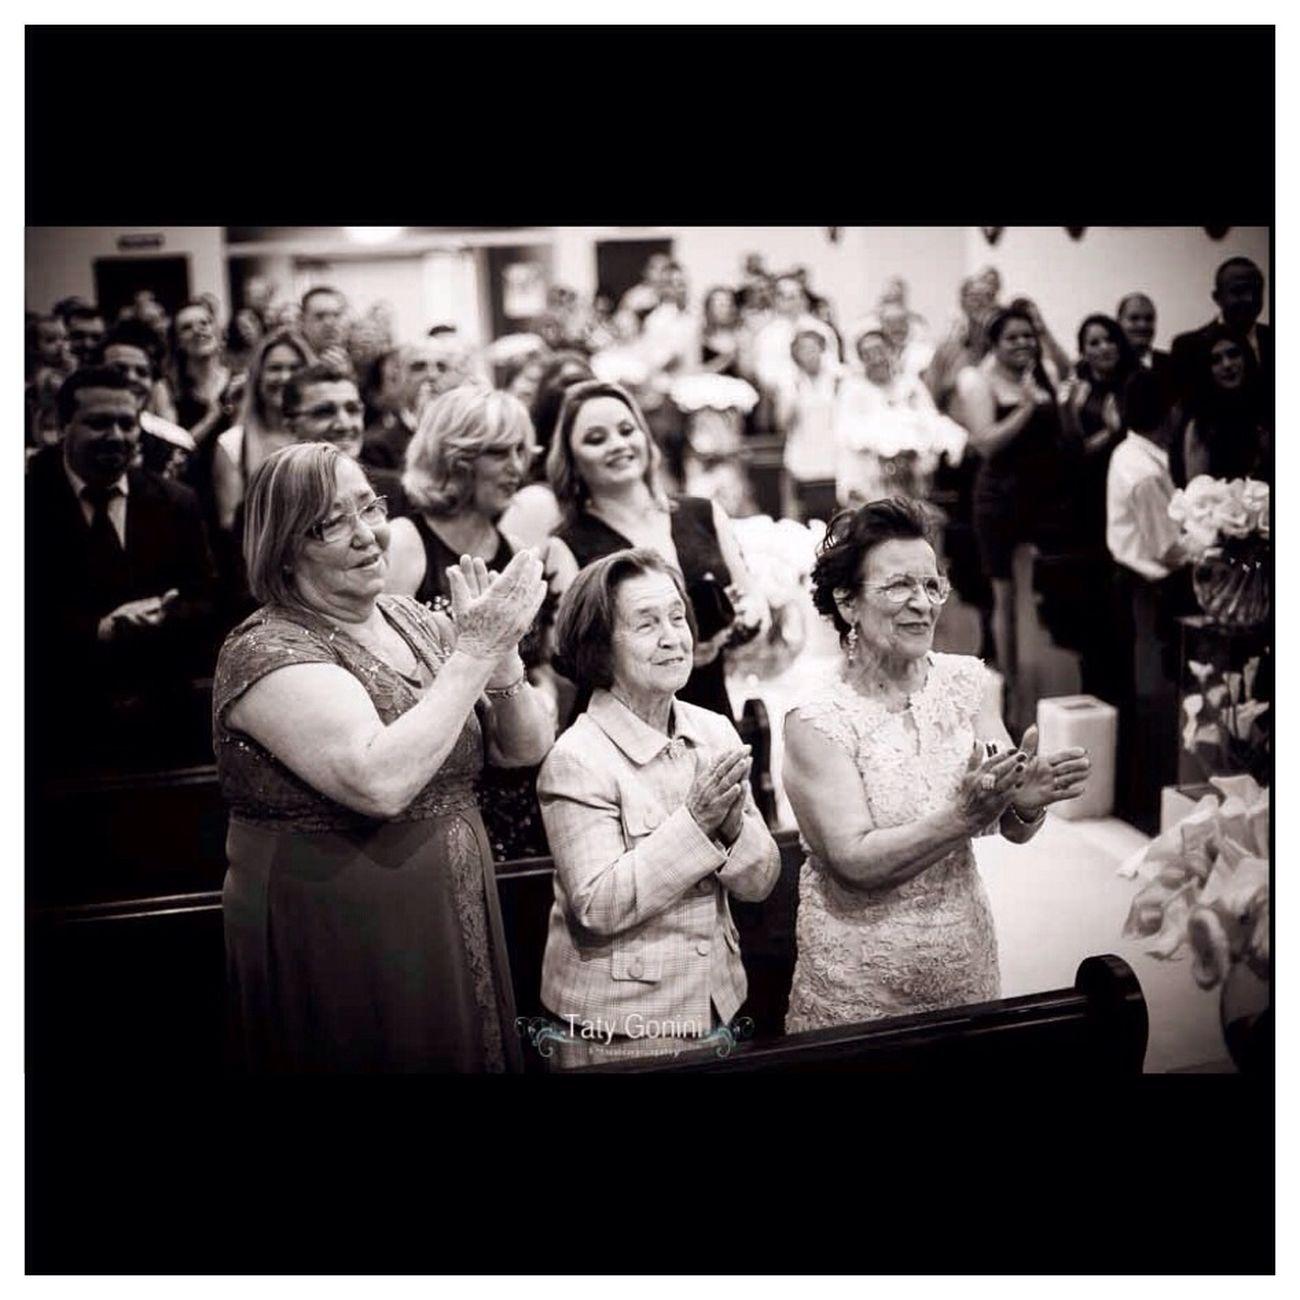 Familia Weedding Casamento Noiva Tatygoninifotografa